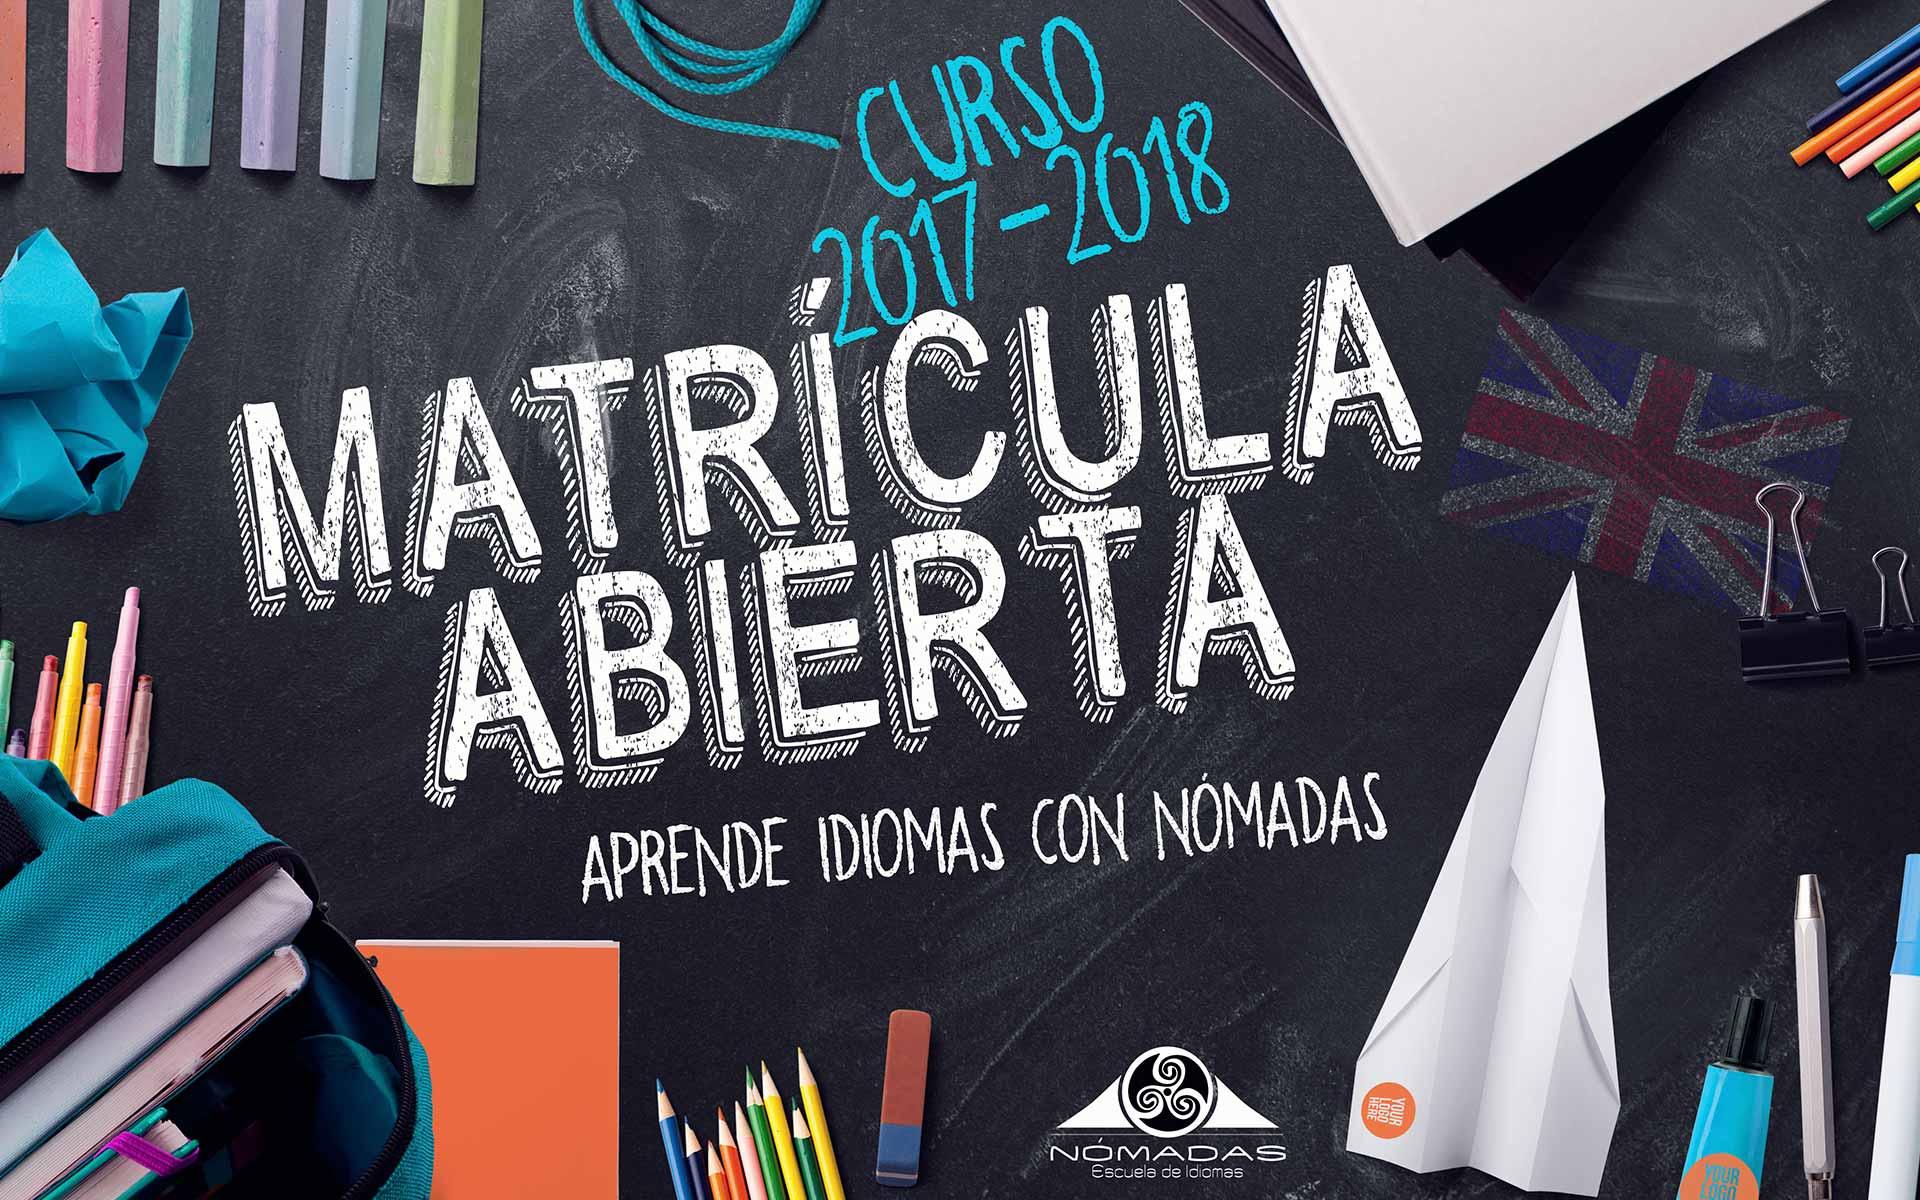 Matricula 2017 2018